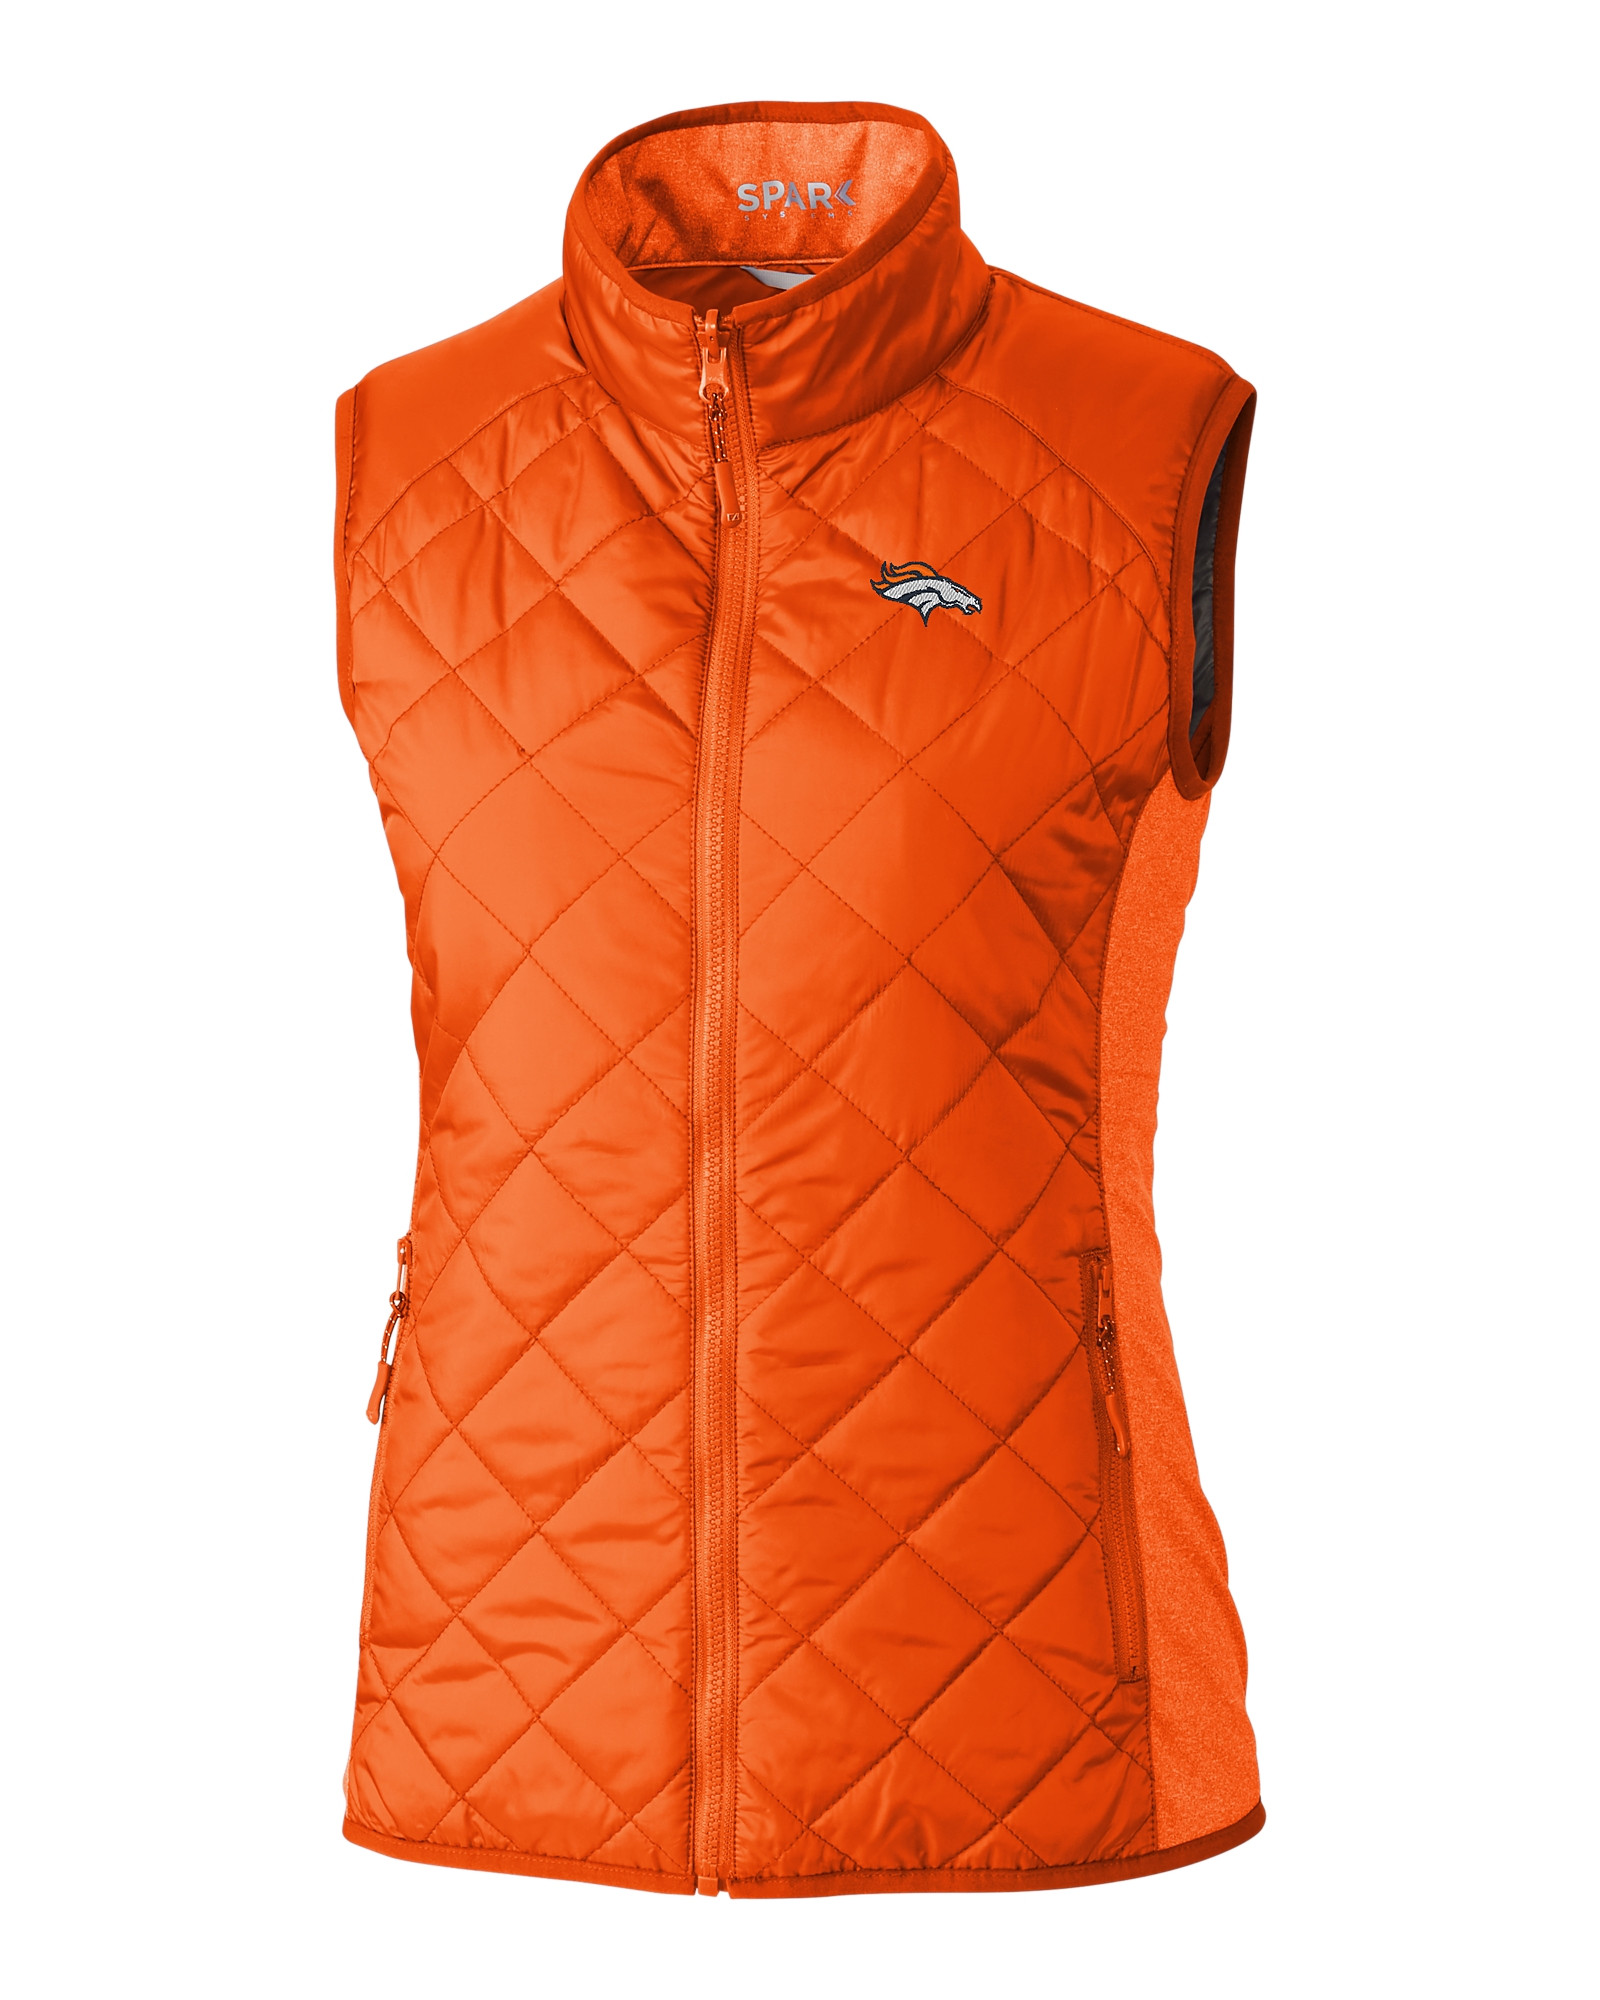 promo code fdc86 9fe62 Denver Broncos Ladies' Sandpoint Quilted Vest